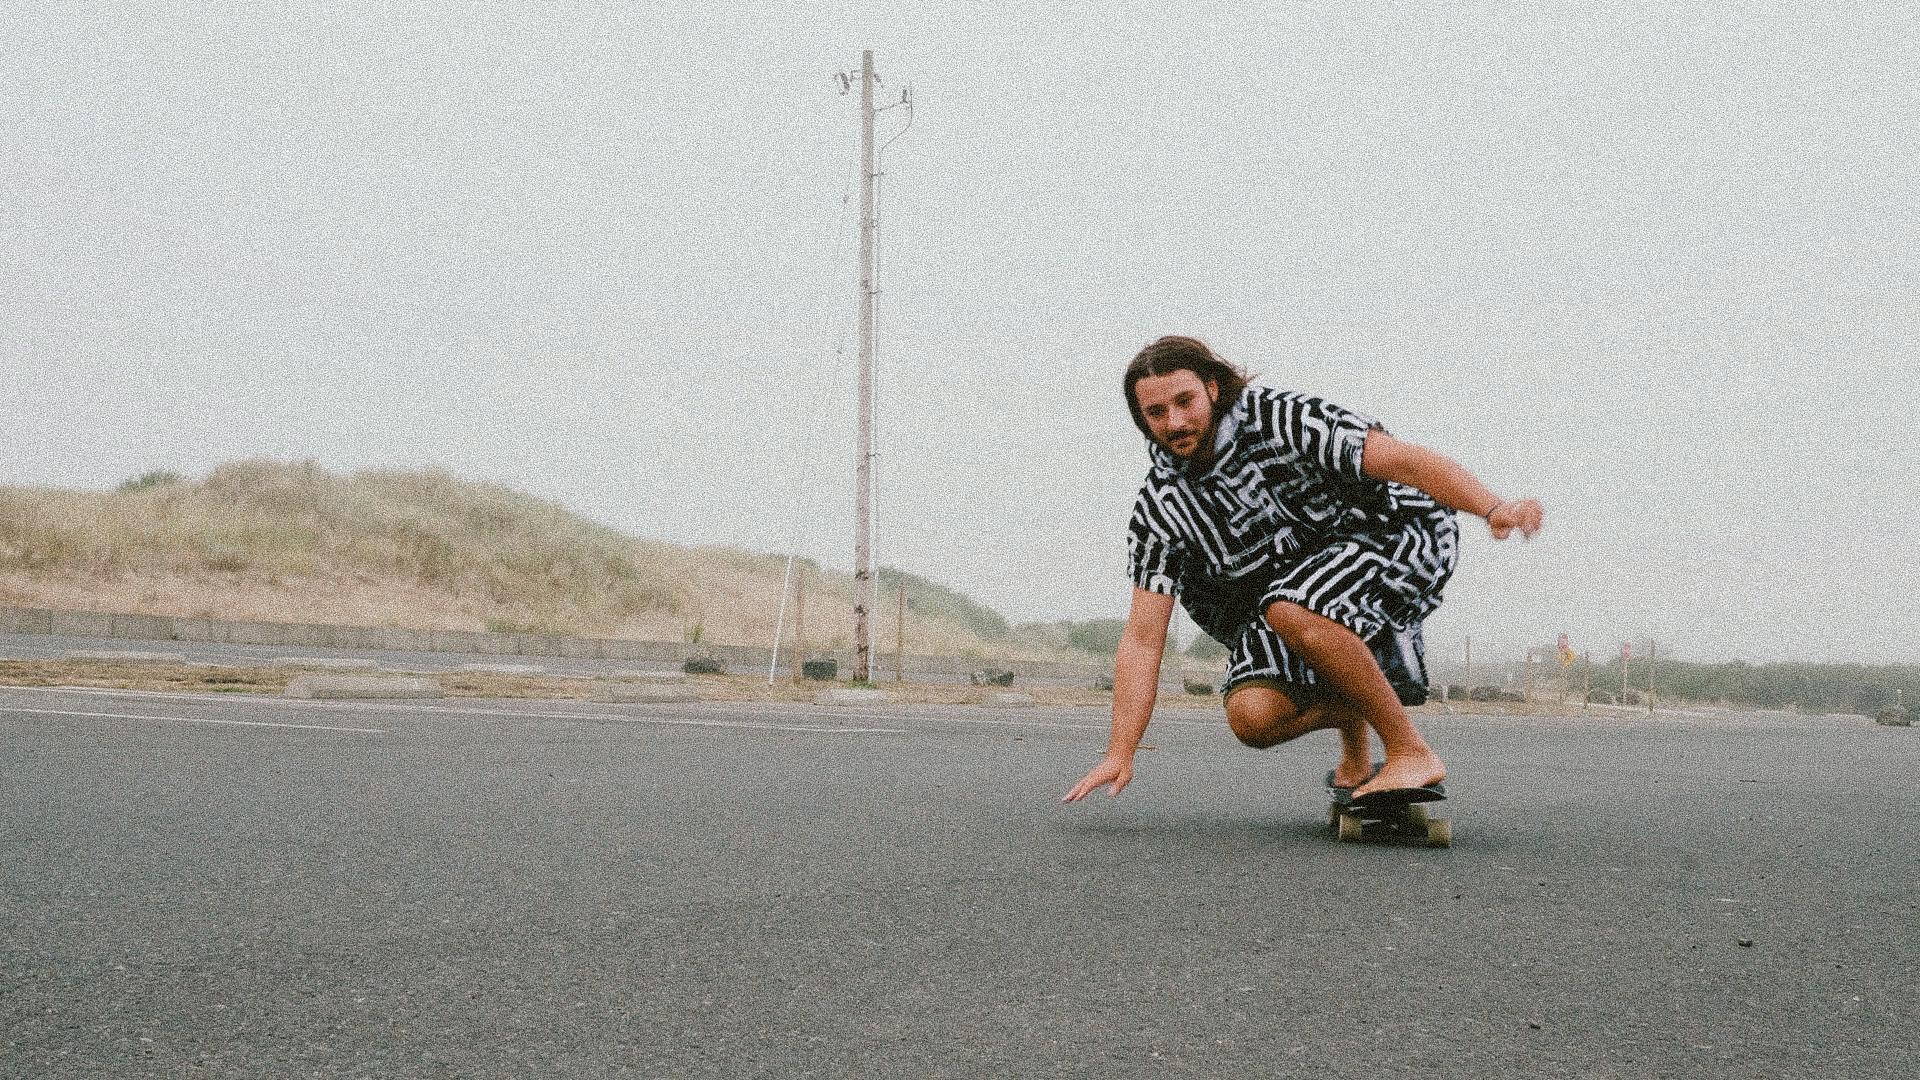 man skateboards in parking lot at beach in westport wa